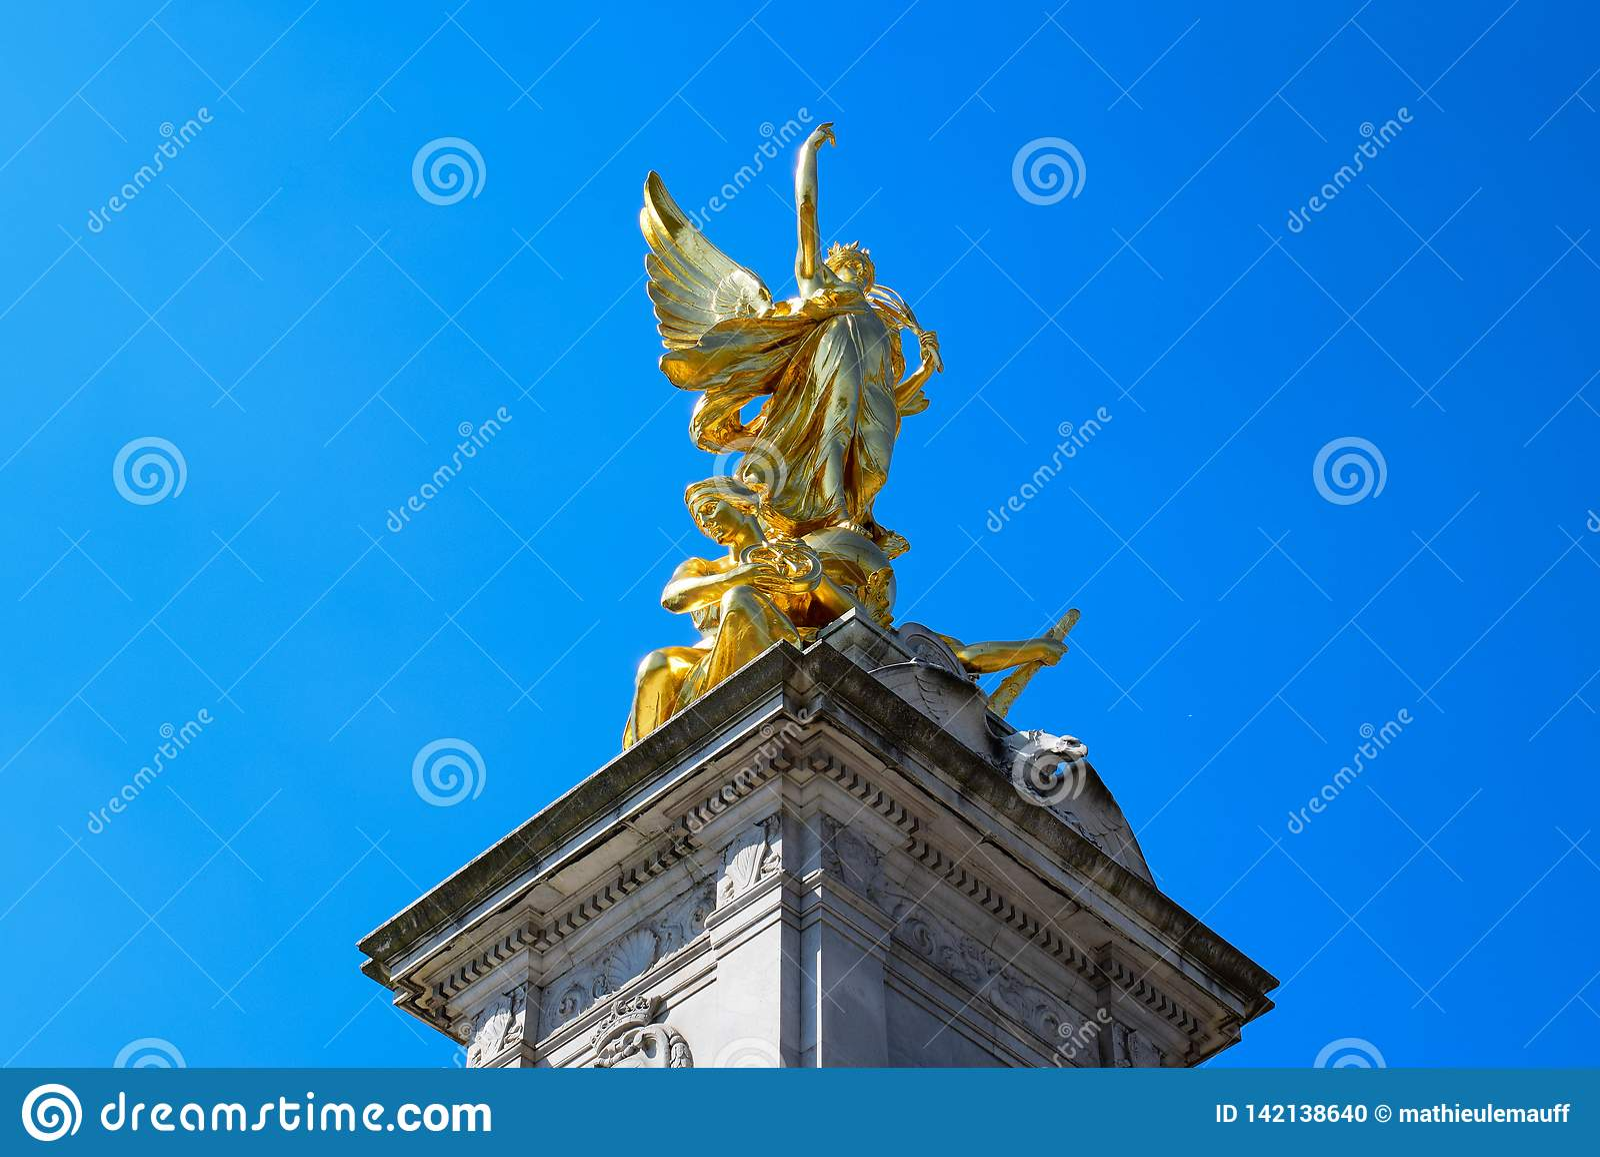 Victoria Memorial Close-Up View delante del Buckingham Palace, Londres, Inglaterra